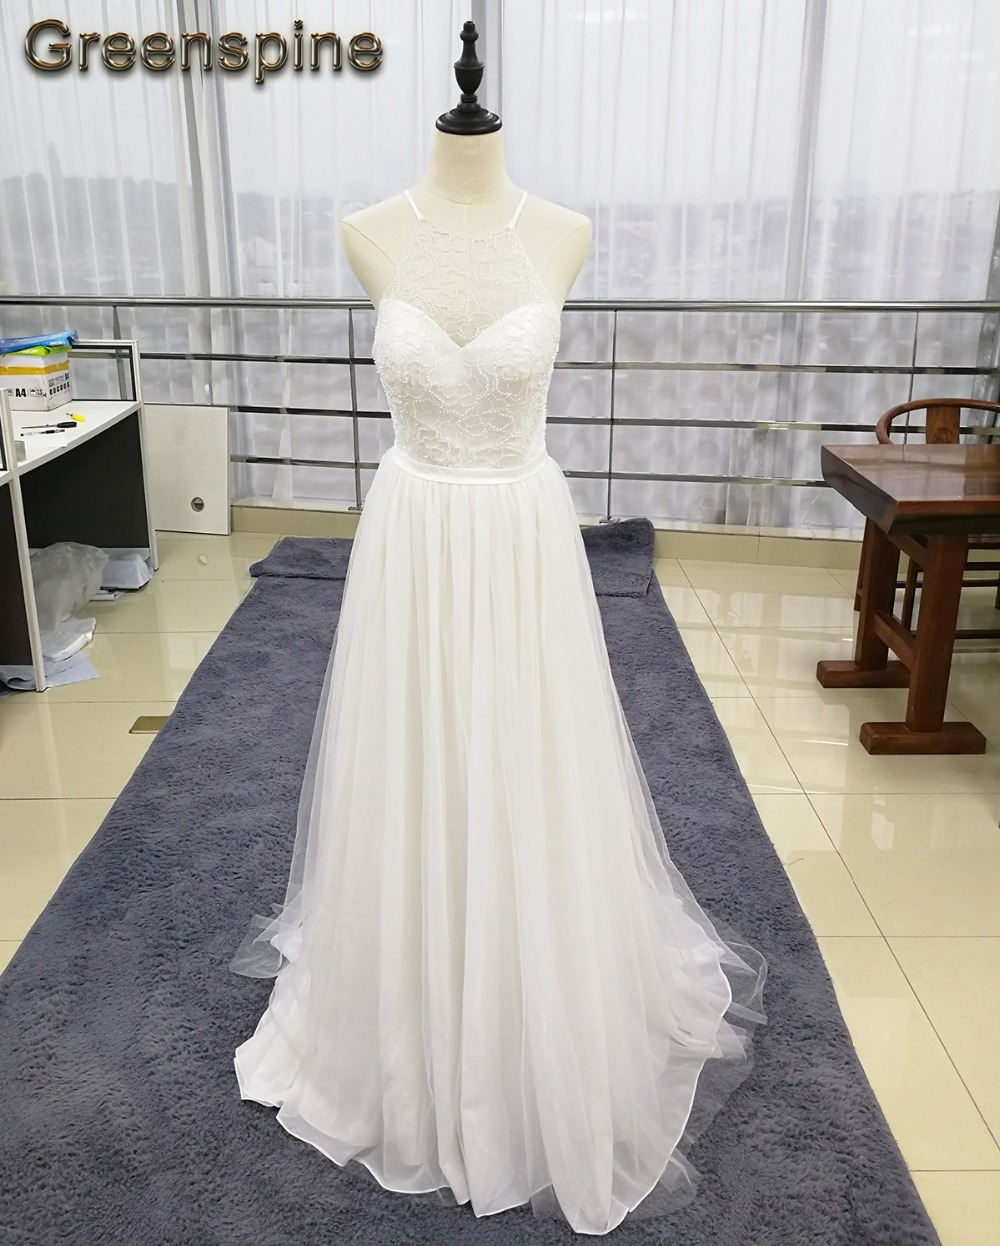 Greenspine Beach Wedding Dress 2019 Halter Beaded Chiffon